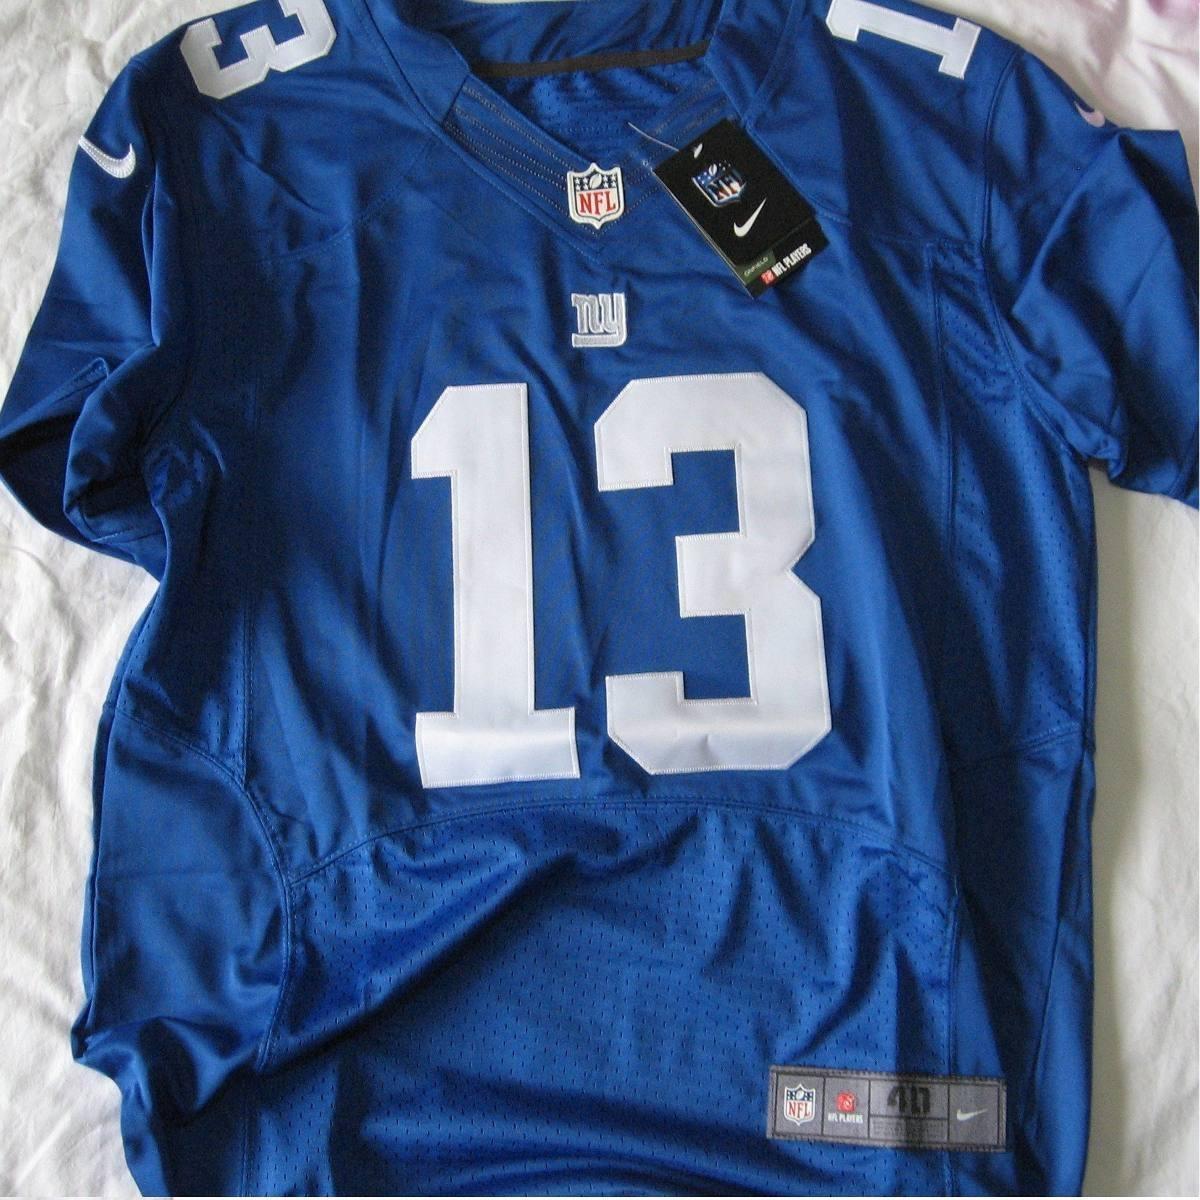 b4362b47f Camisa Futebol Americano Nfl New York Giants Tam M N° 10 - R  199